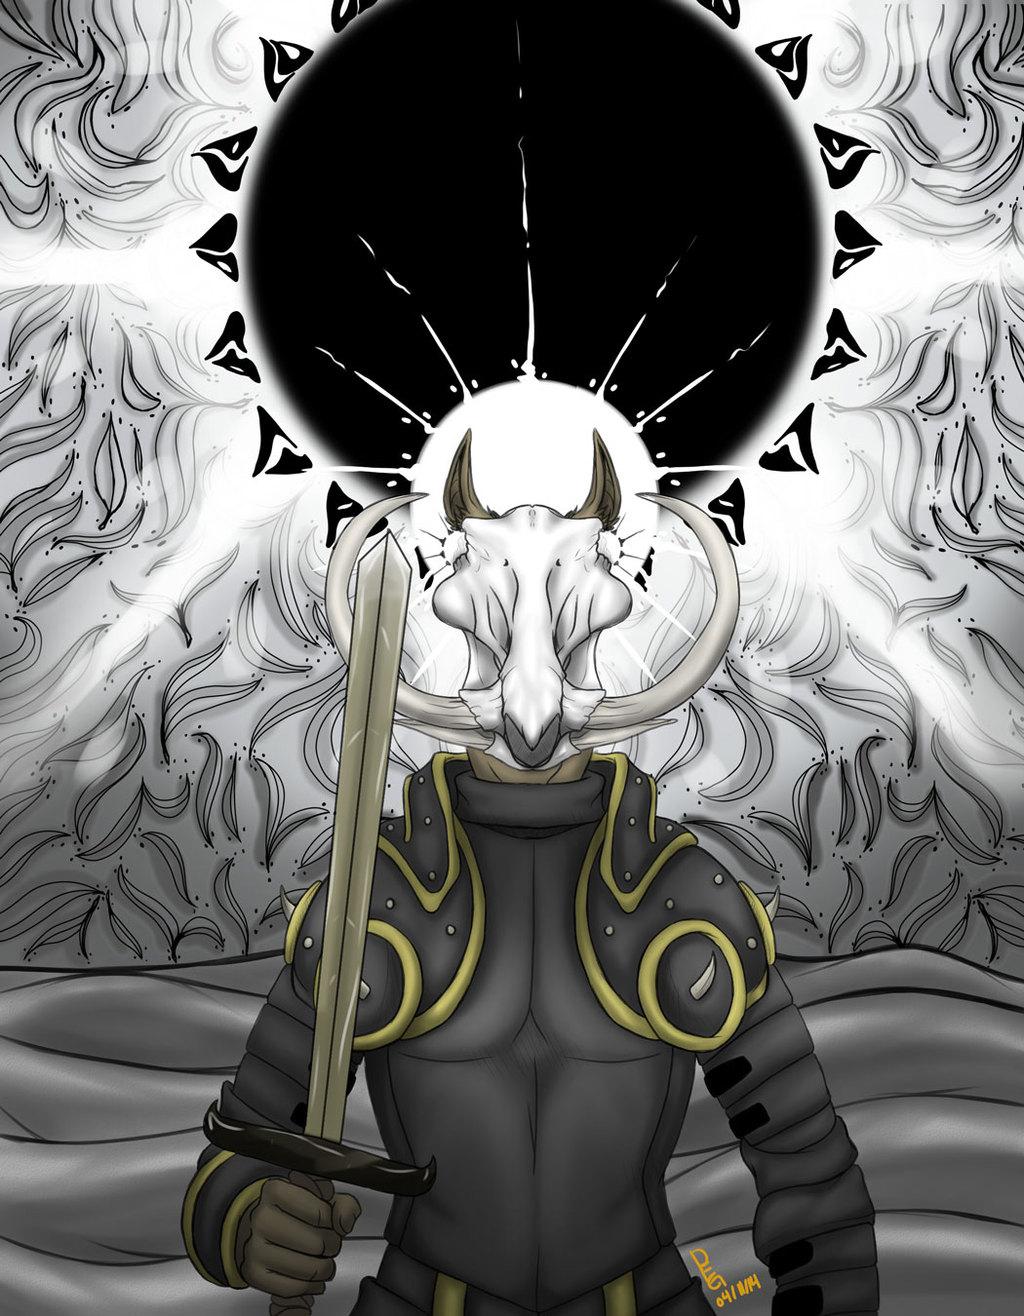 Most recent image: Black Sun